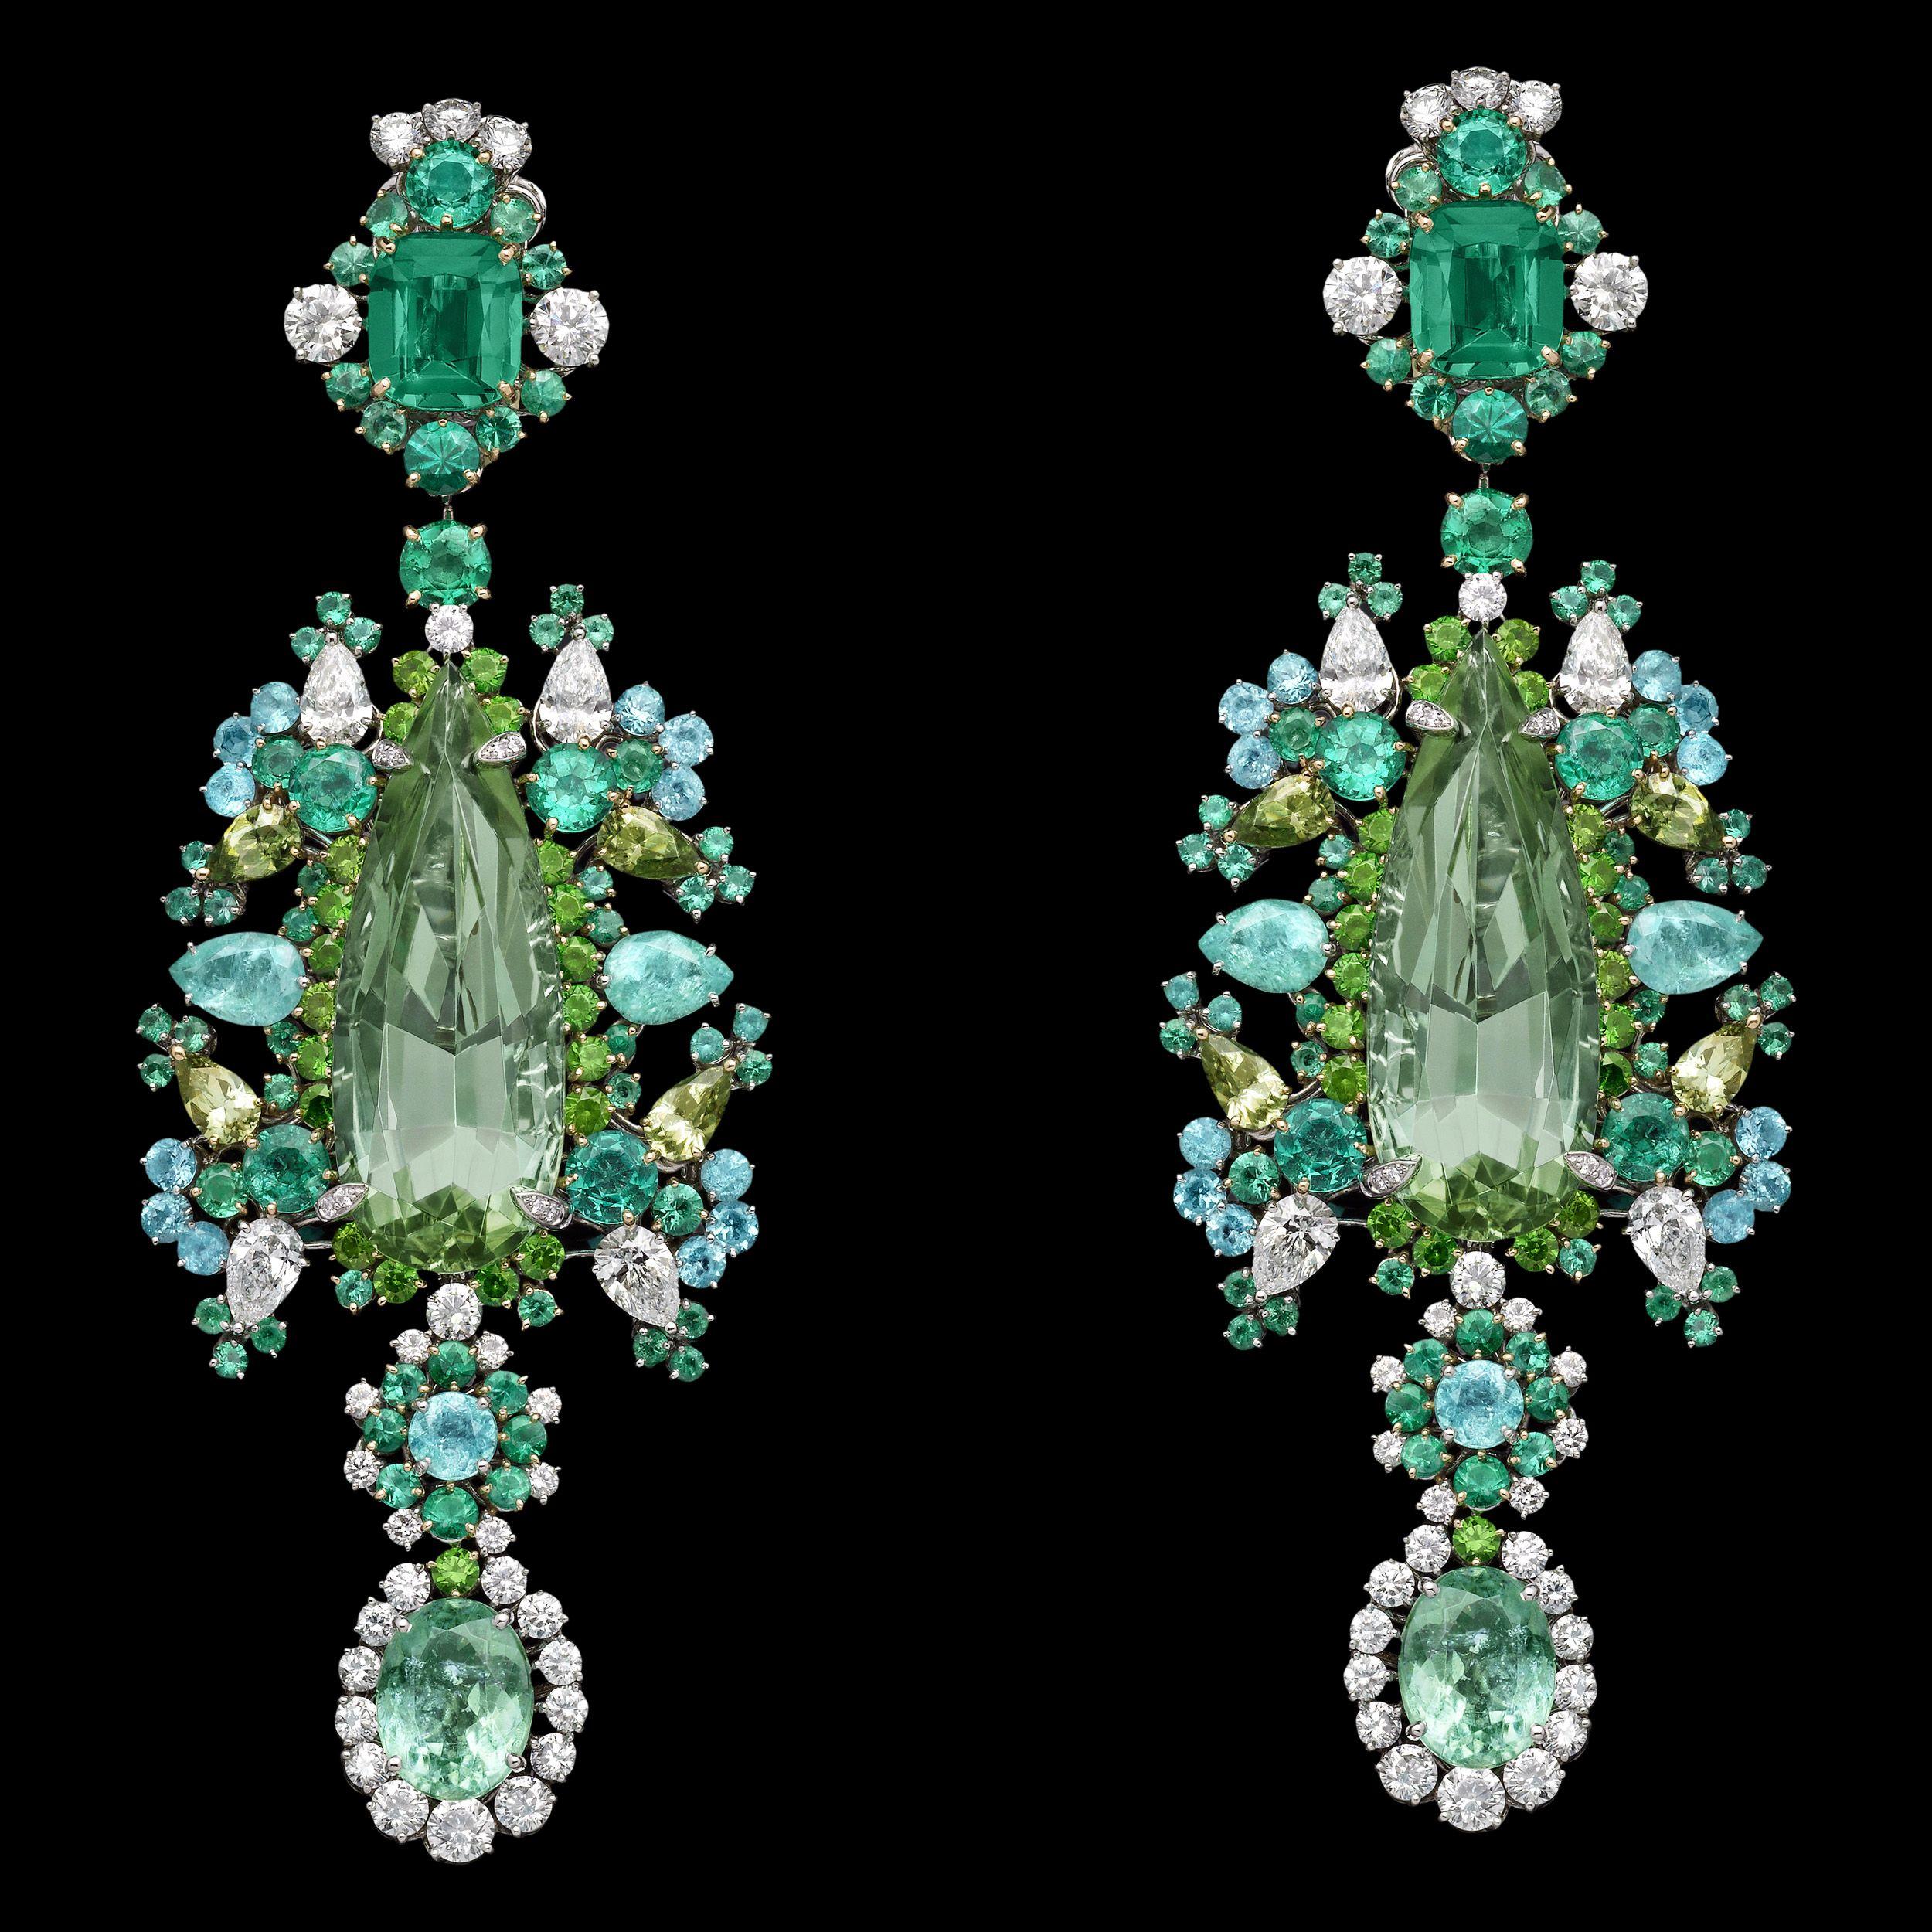 Dior Jewellery – Dear Dior: 'Organza Brodé Paraiba' earrings. Discover more on www.dior.com